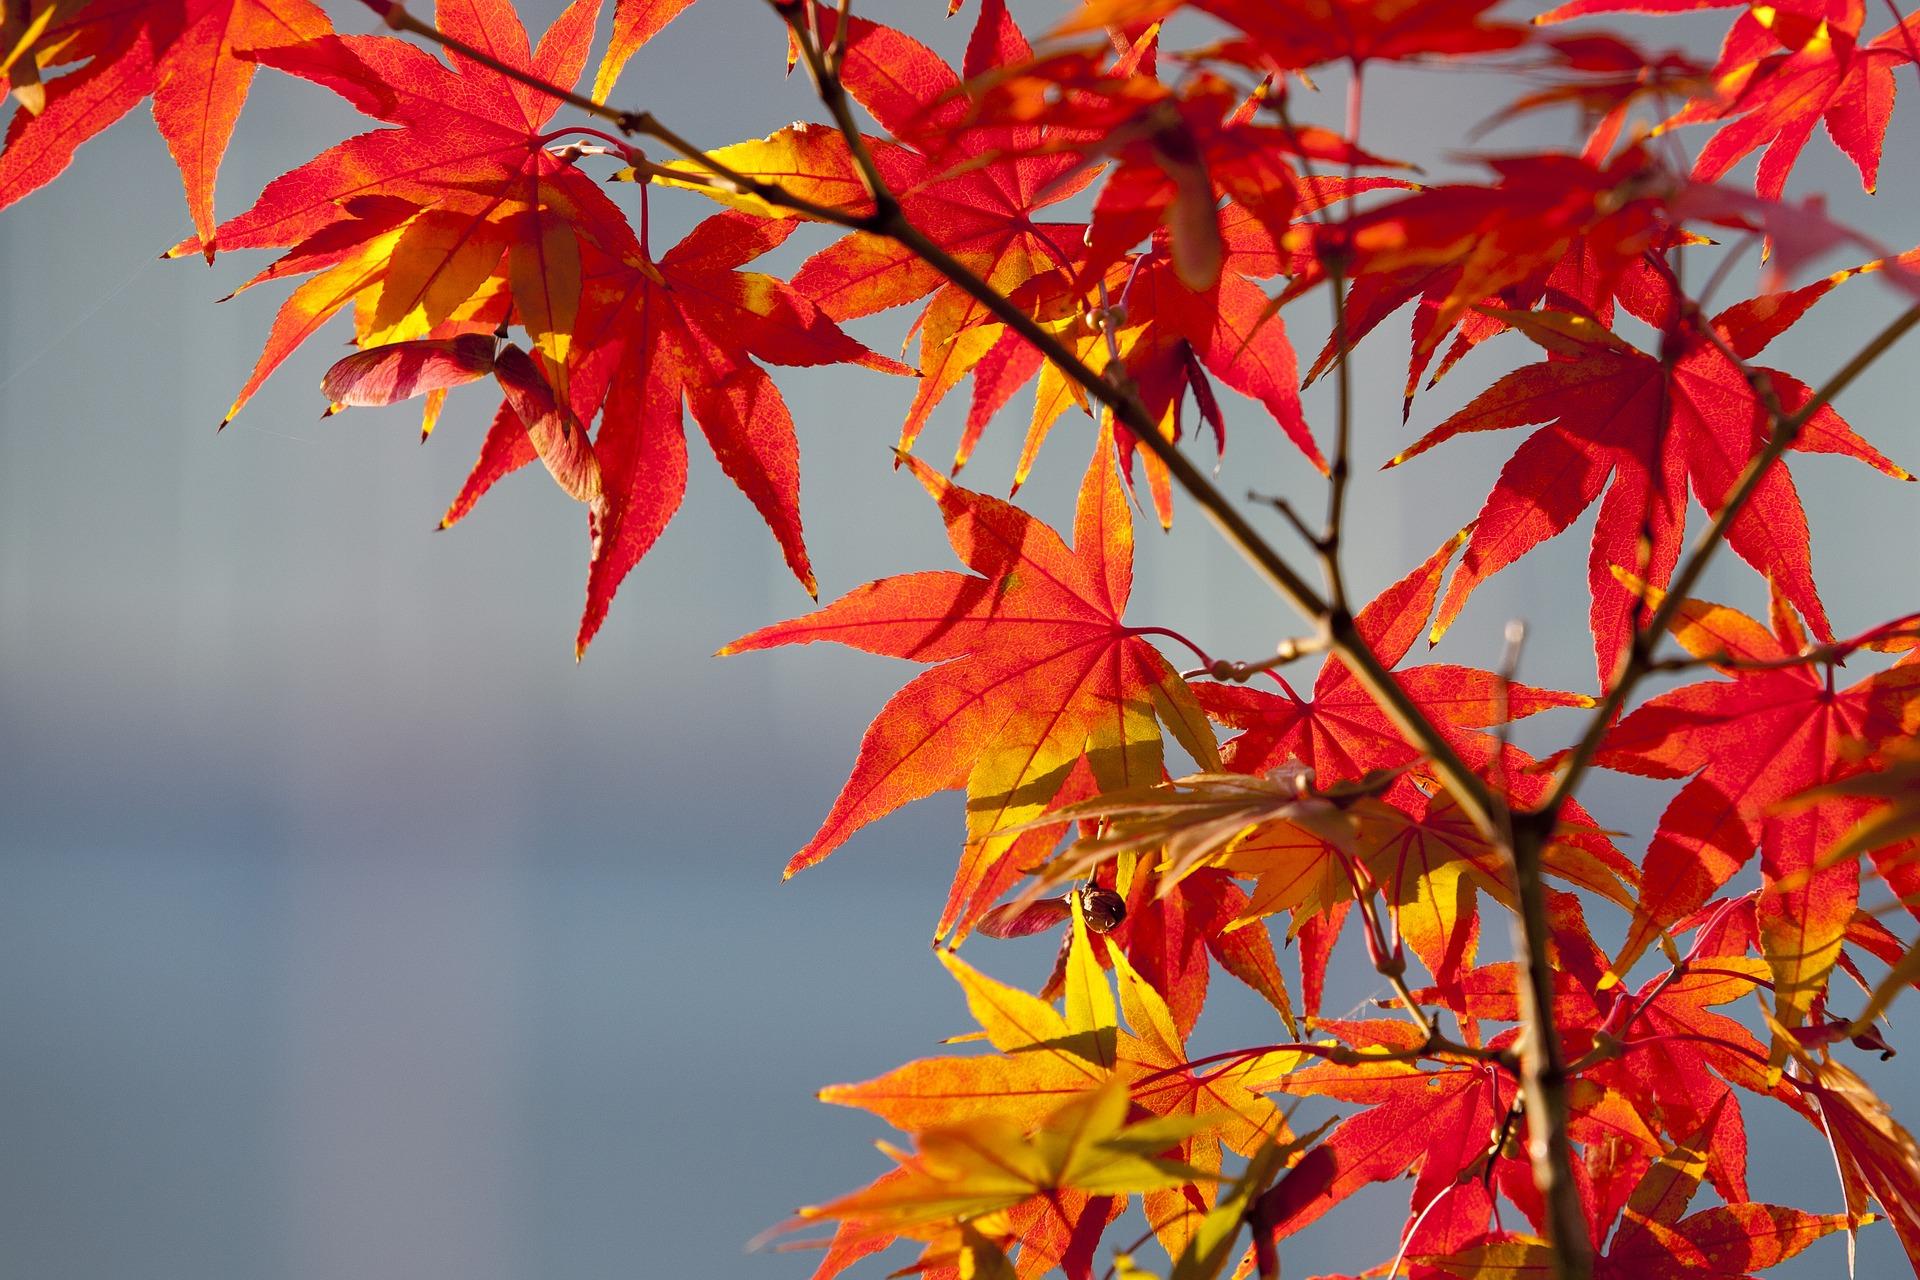 maple-leaf-2933340_1920.jpg